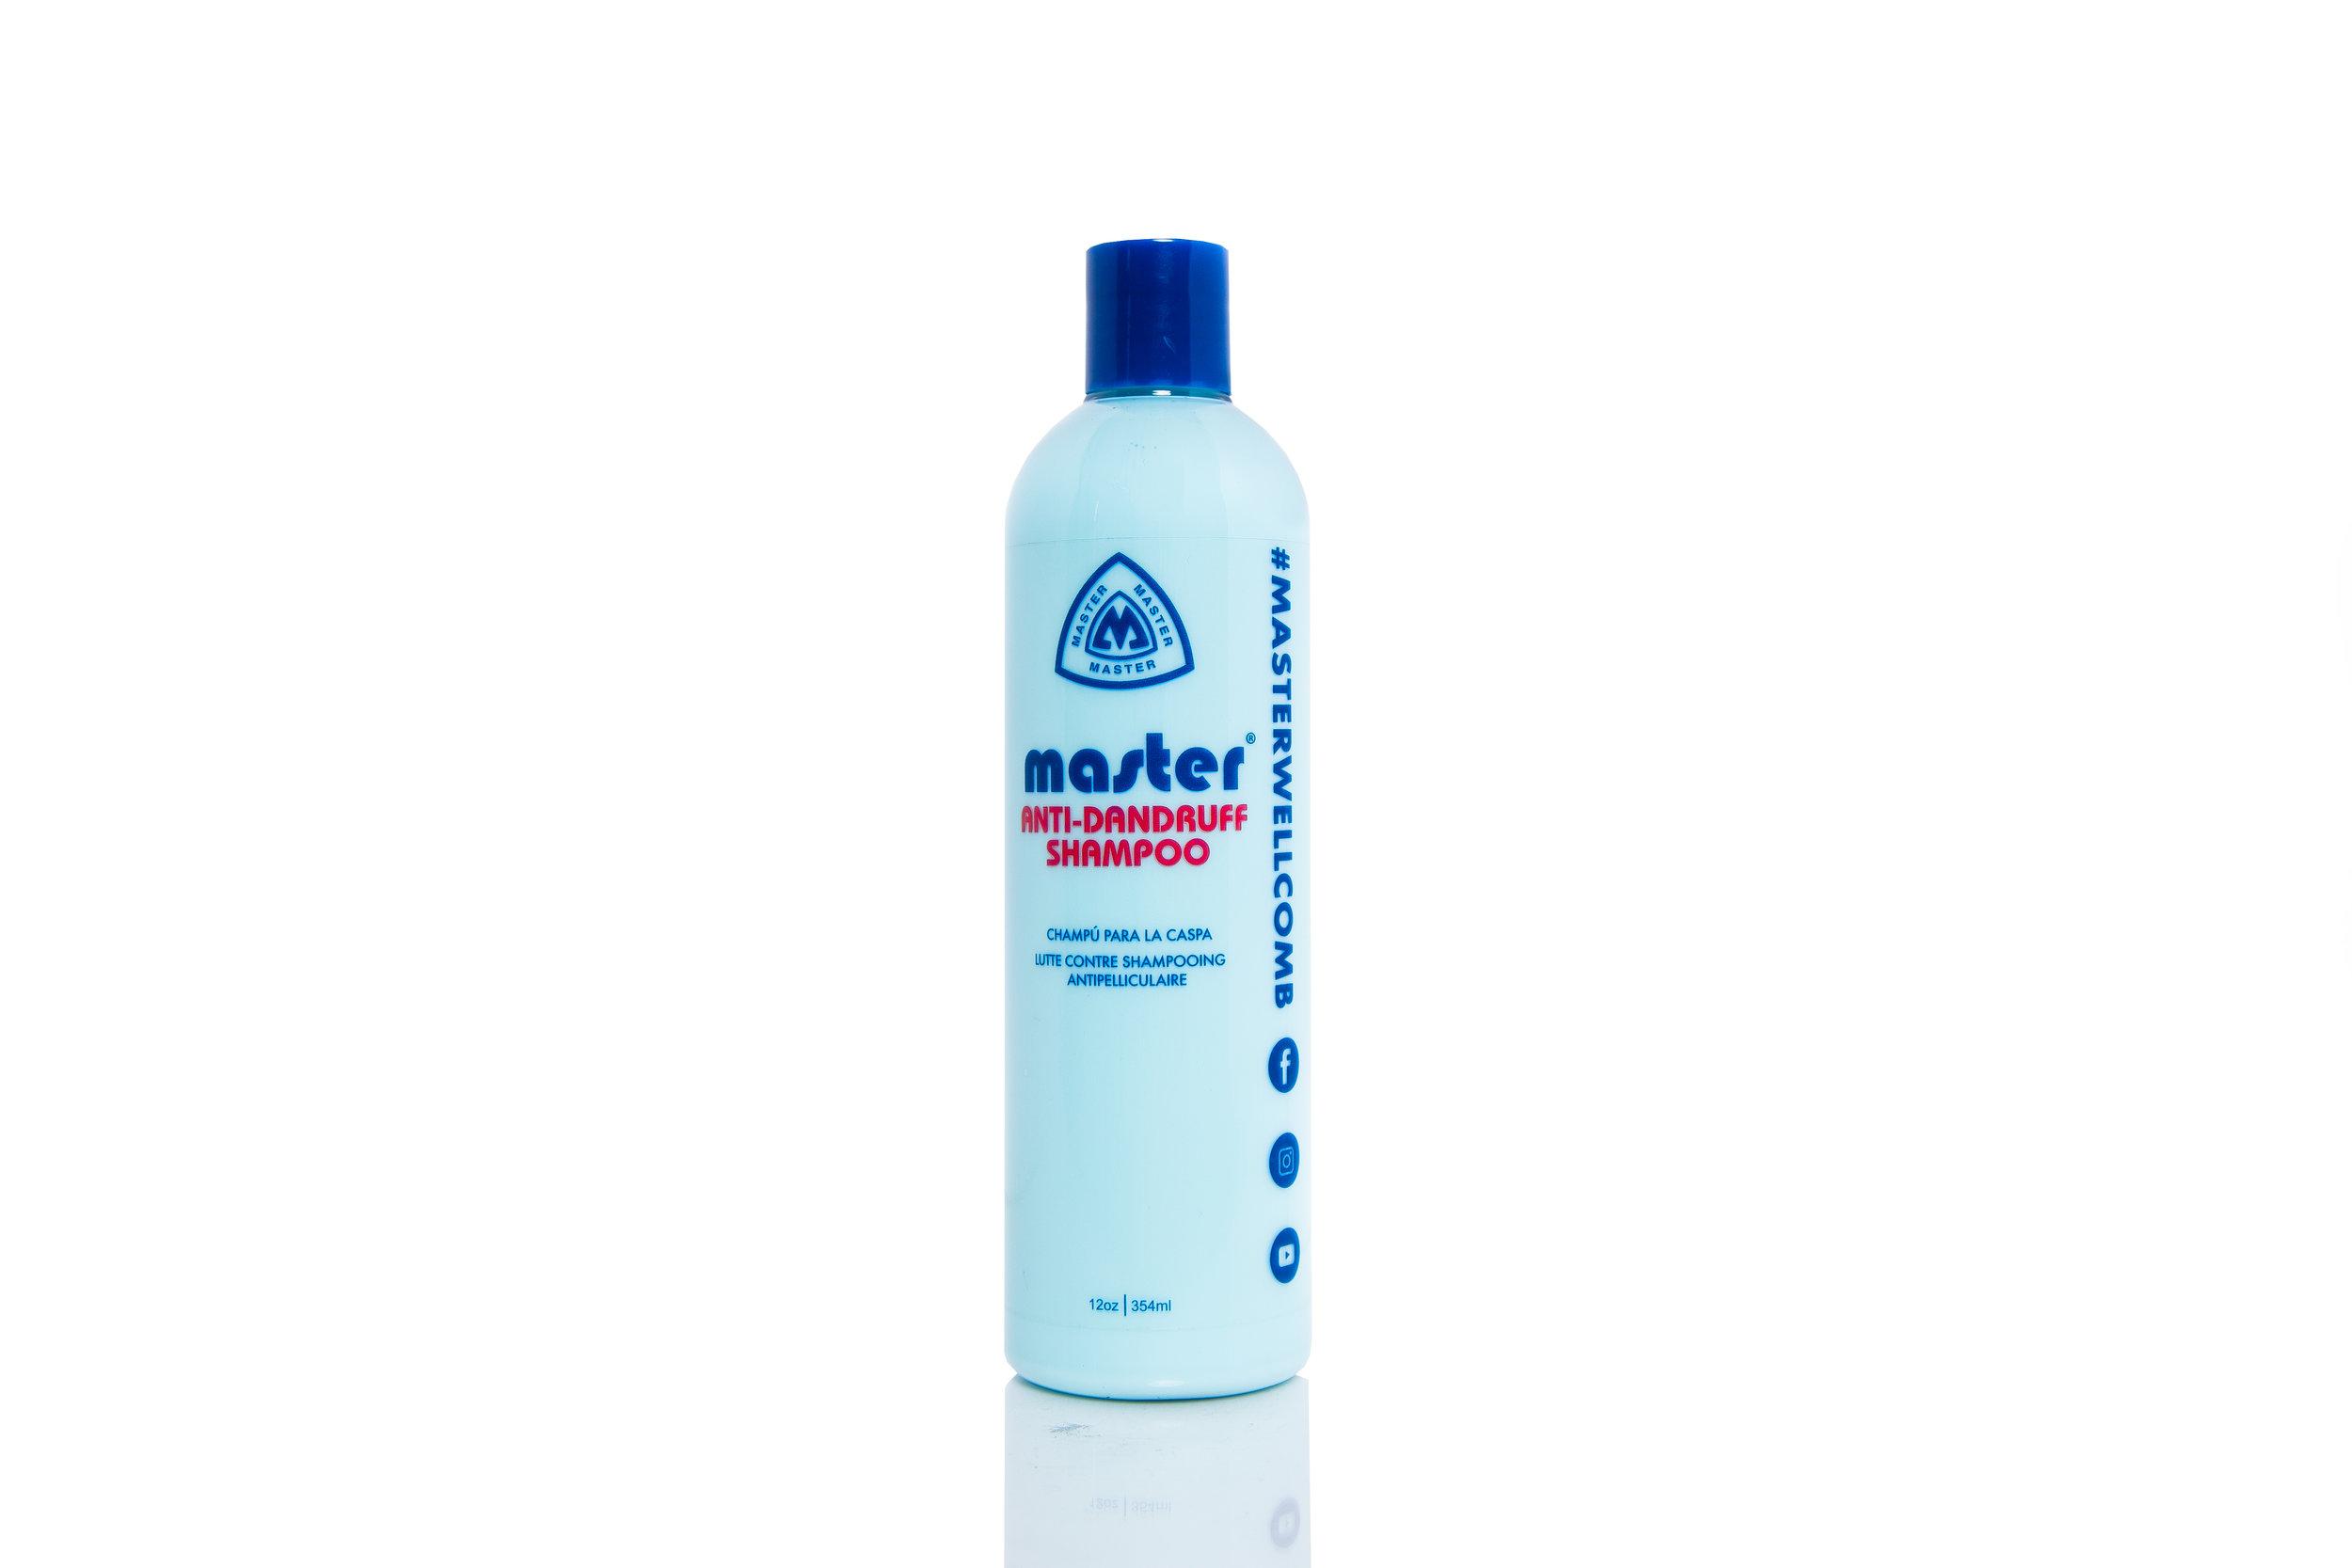 12oz Anti-Dandruff Shampoo.jpg